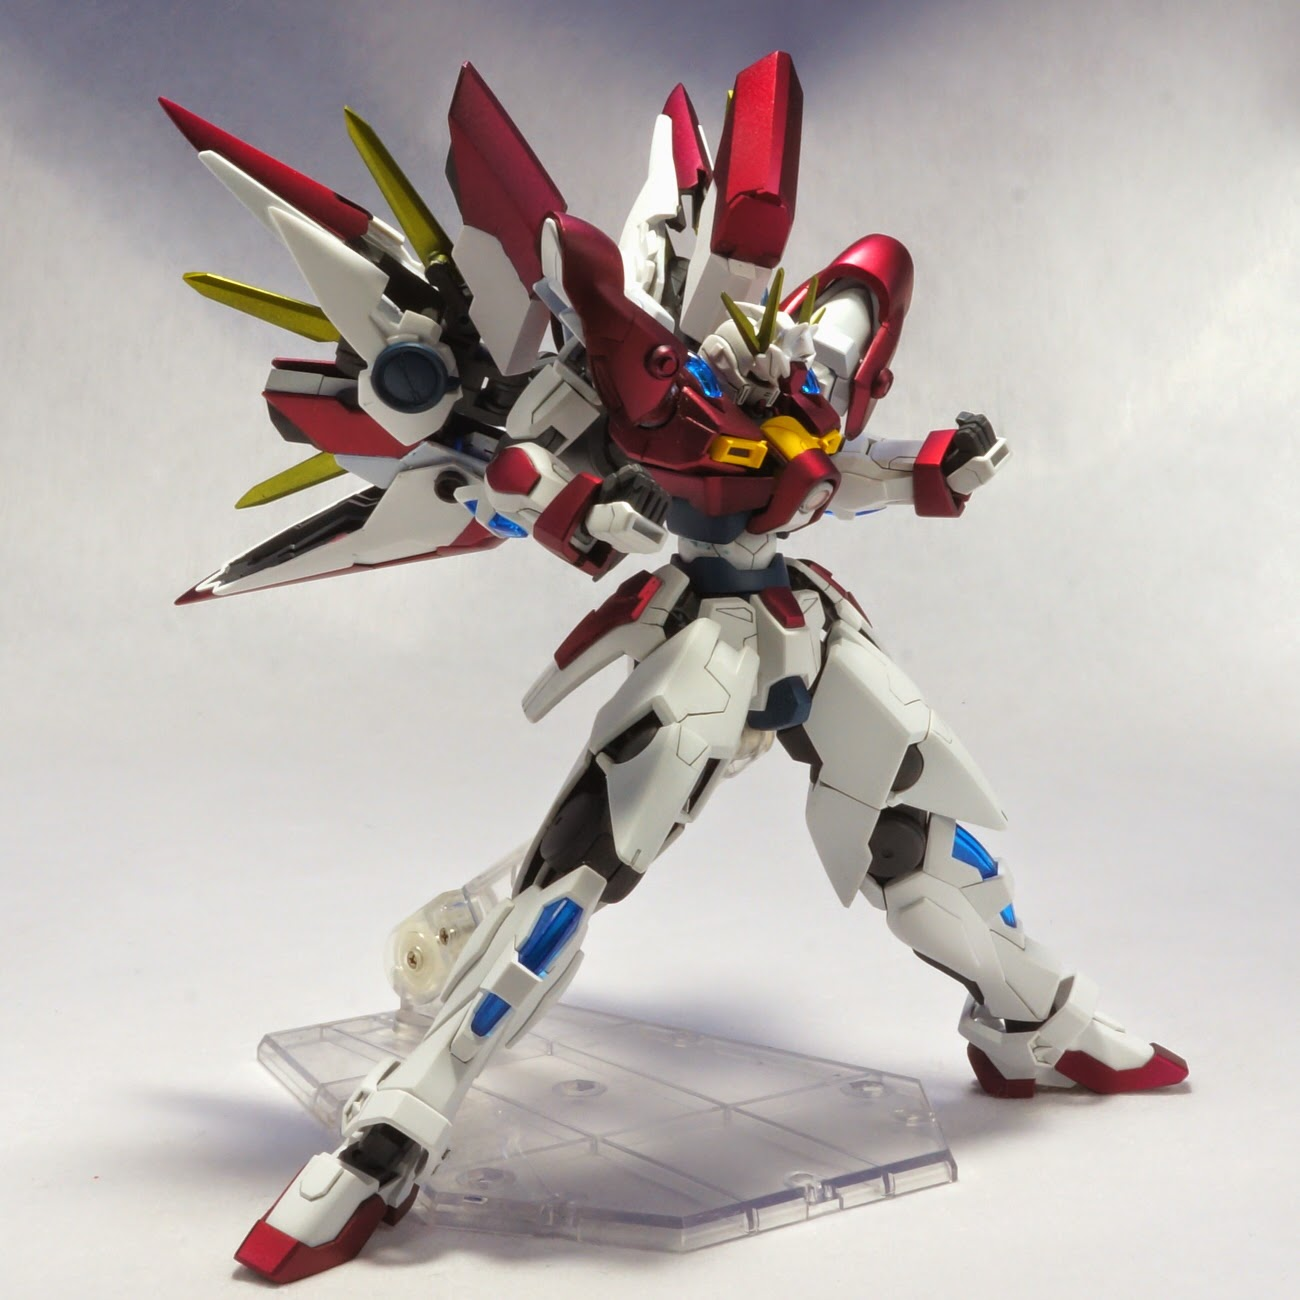 Custom Build 1 144 Build Blazing Gundam Gundam Kits Collection News And Reviews